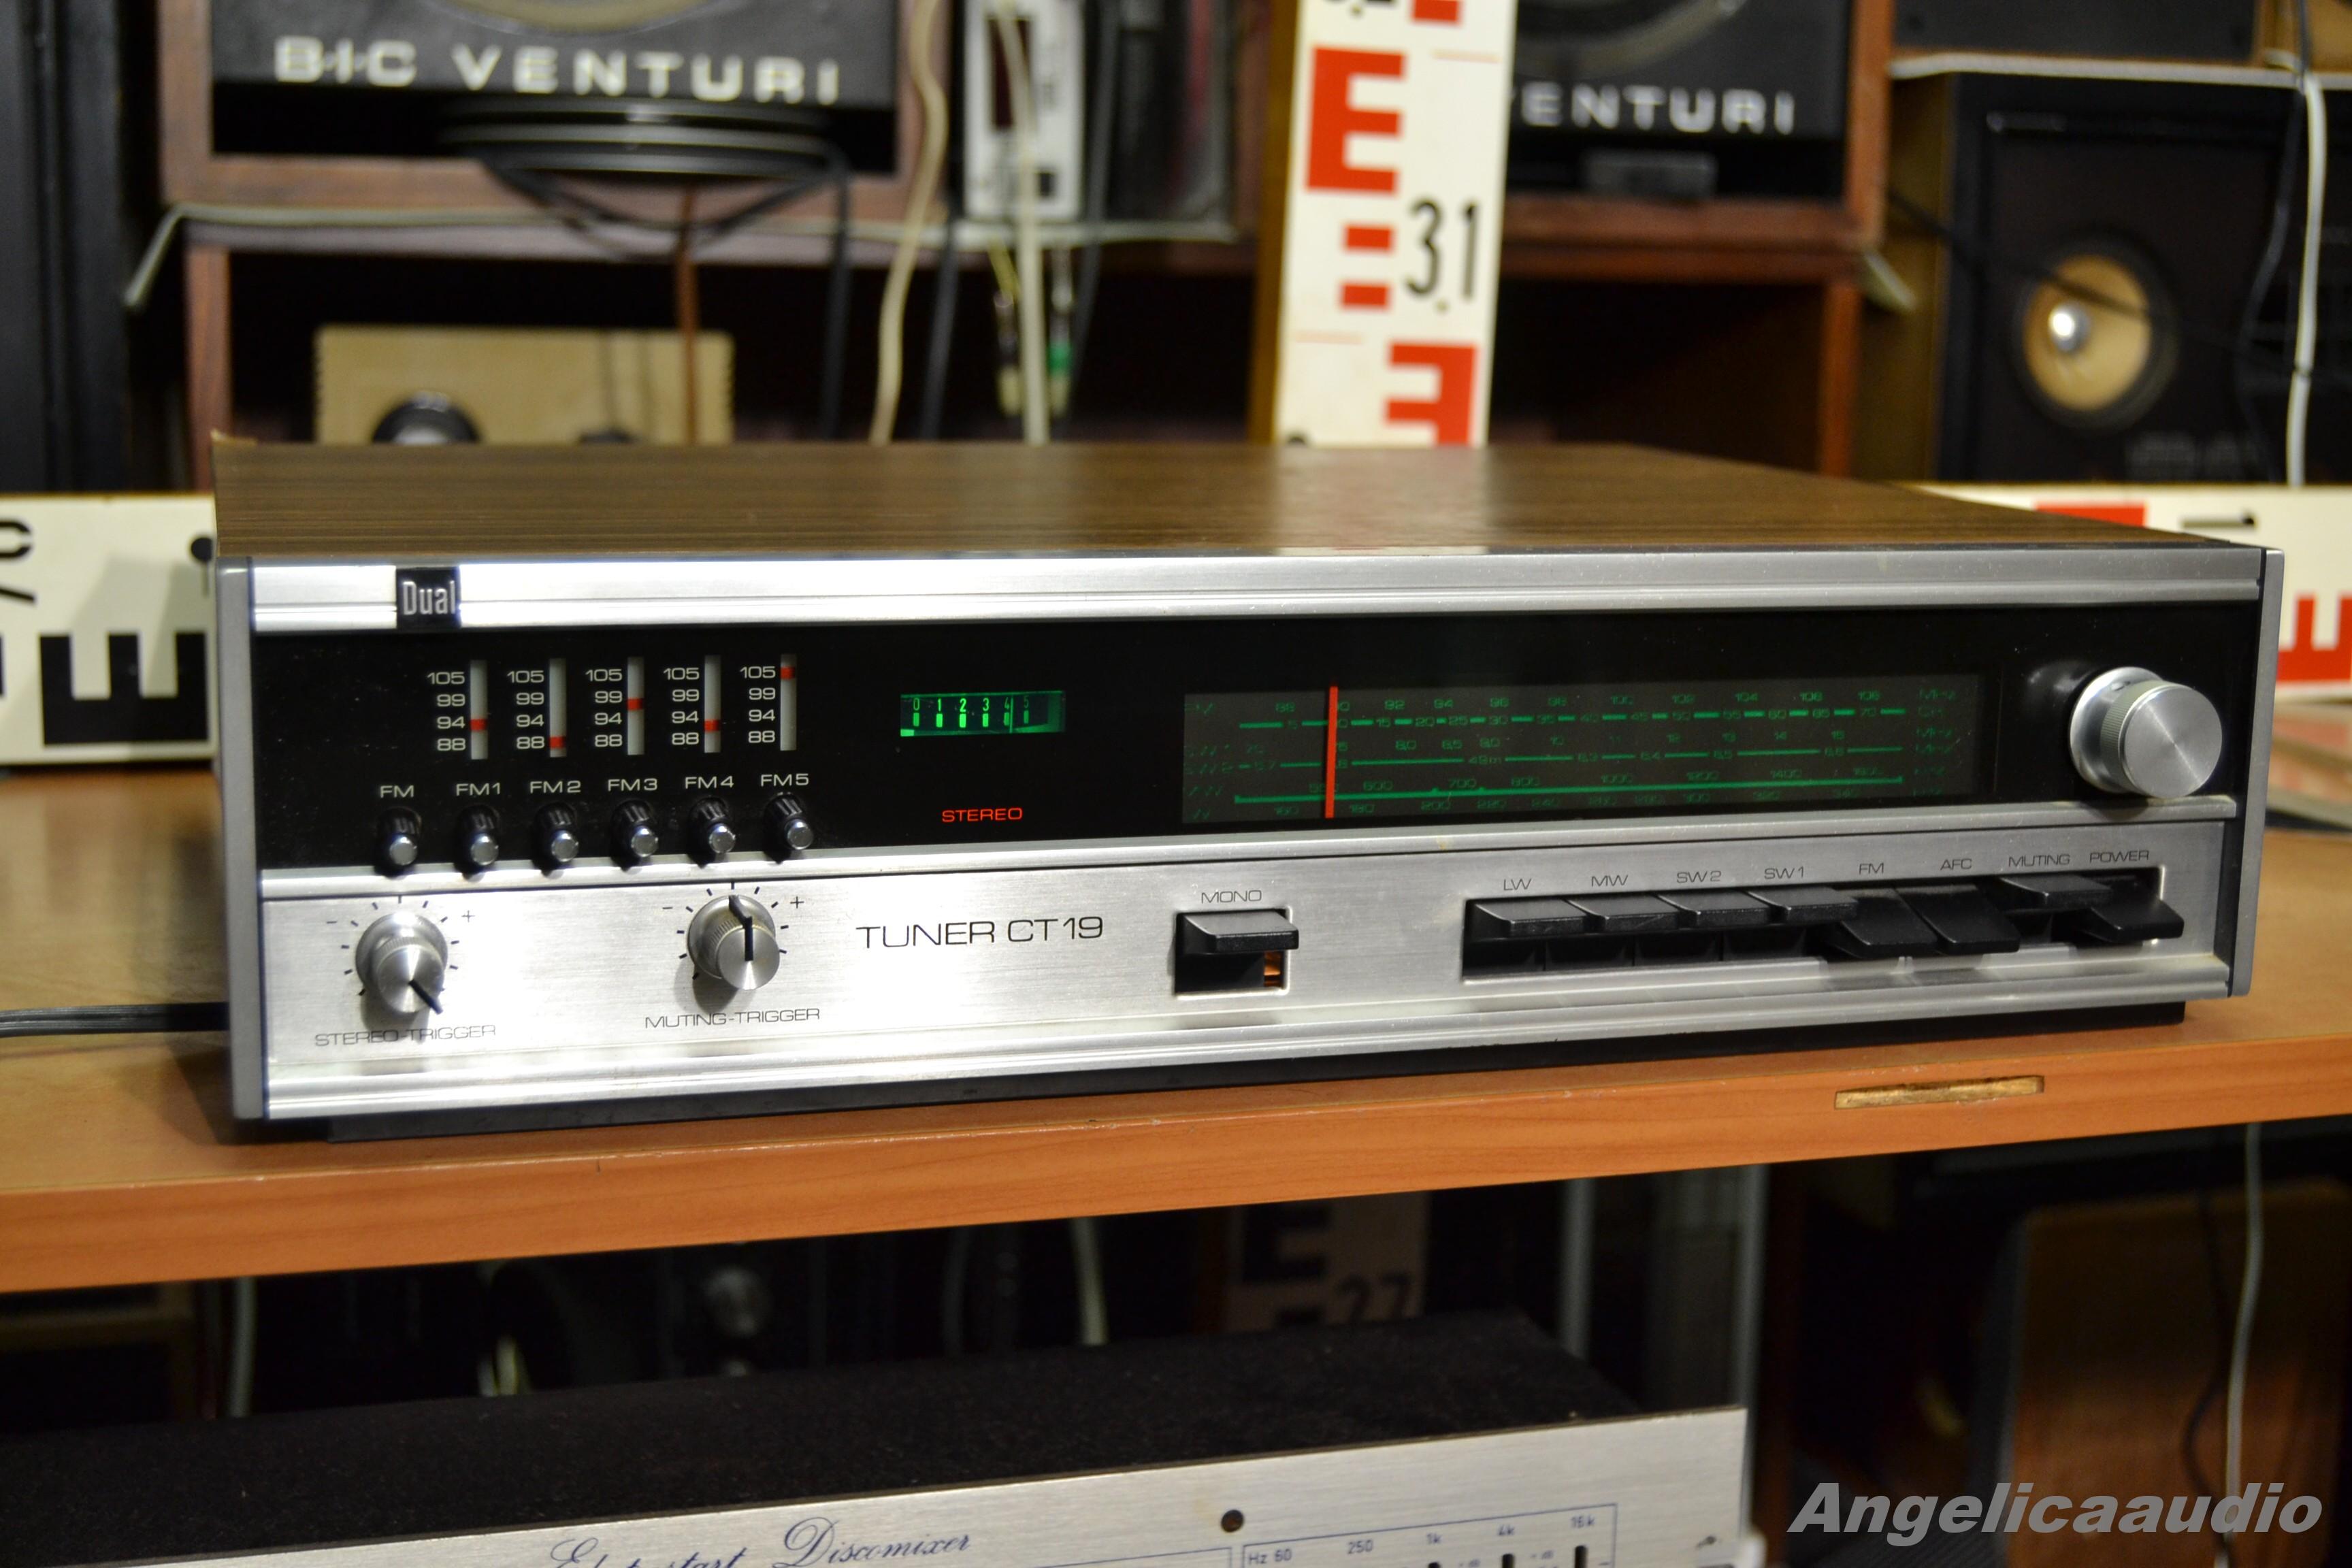 Tesla 2019 >> Dual CT19 Stereo Tuner : Angelicaaudio 1990